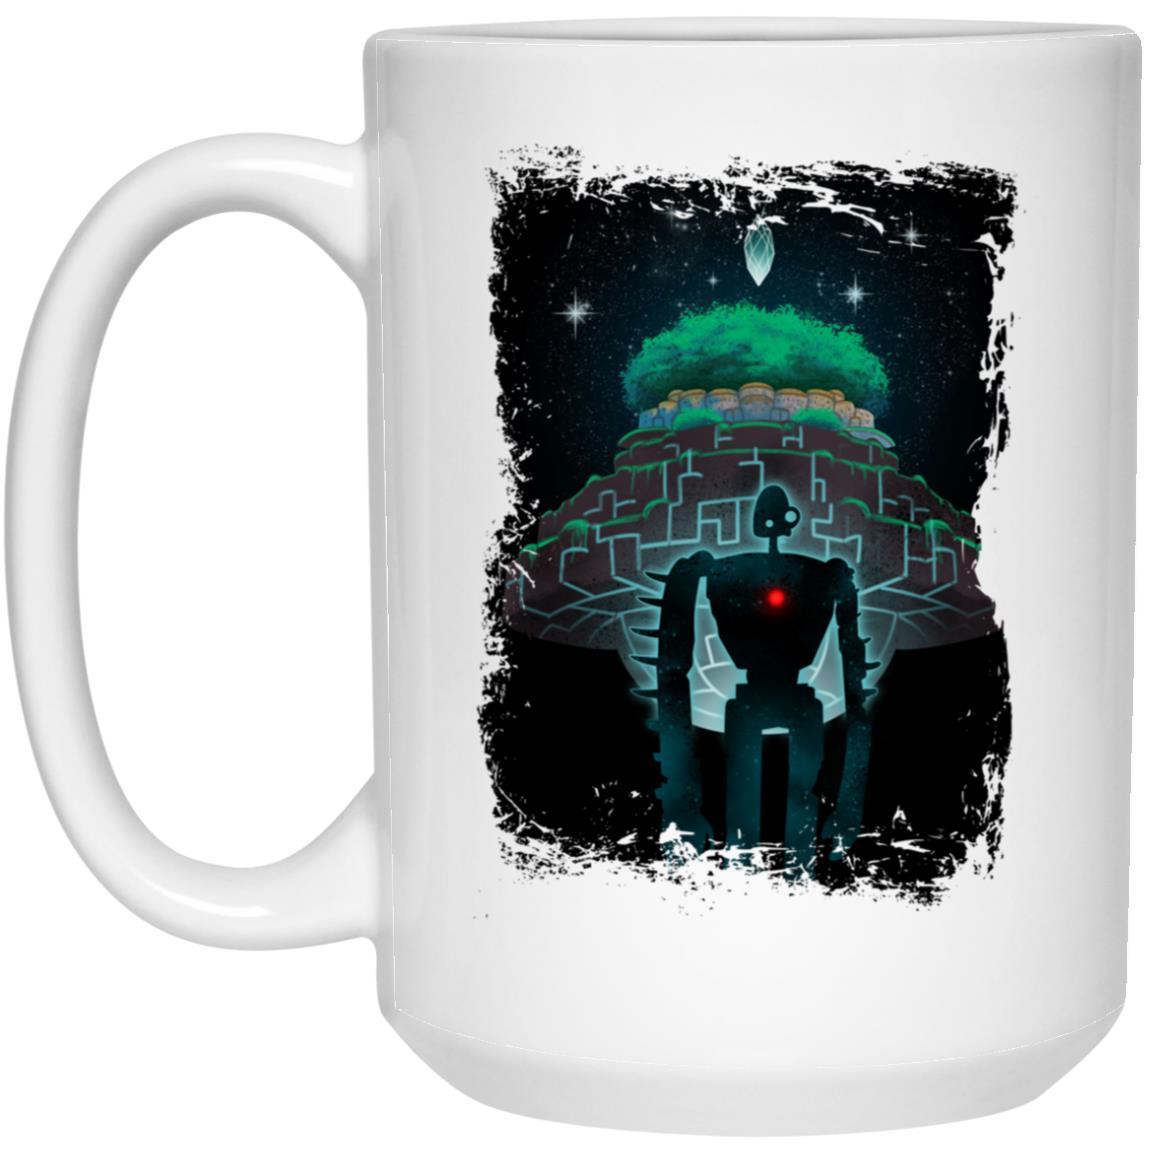 Laputa: Castle in The Sky Nigh Time Mug